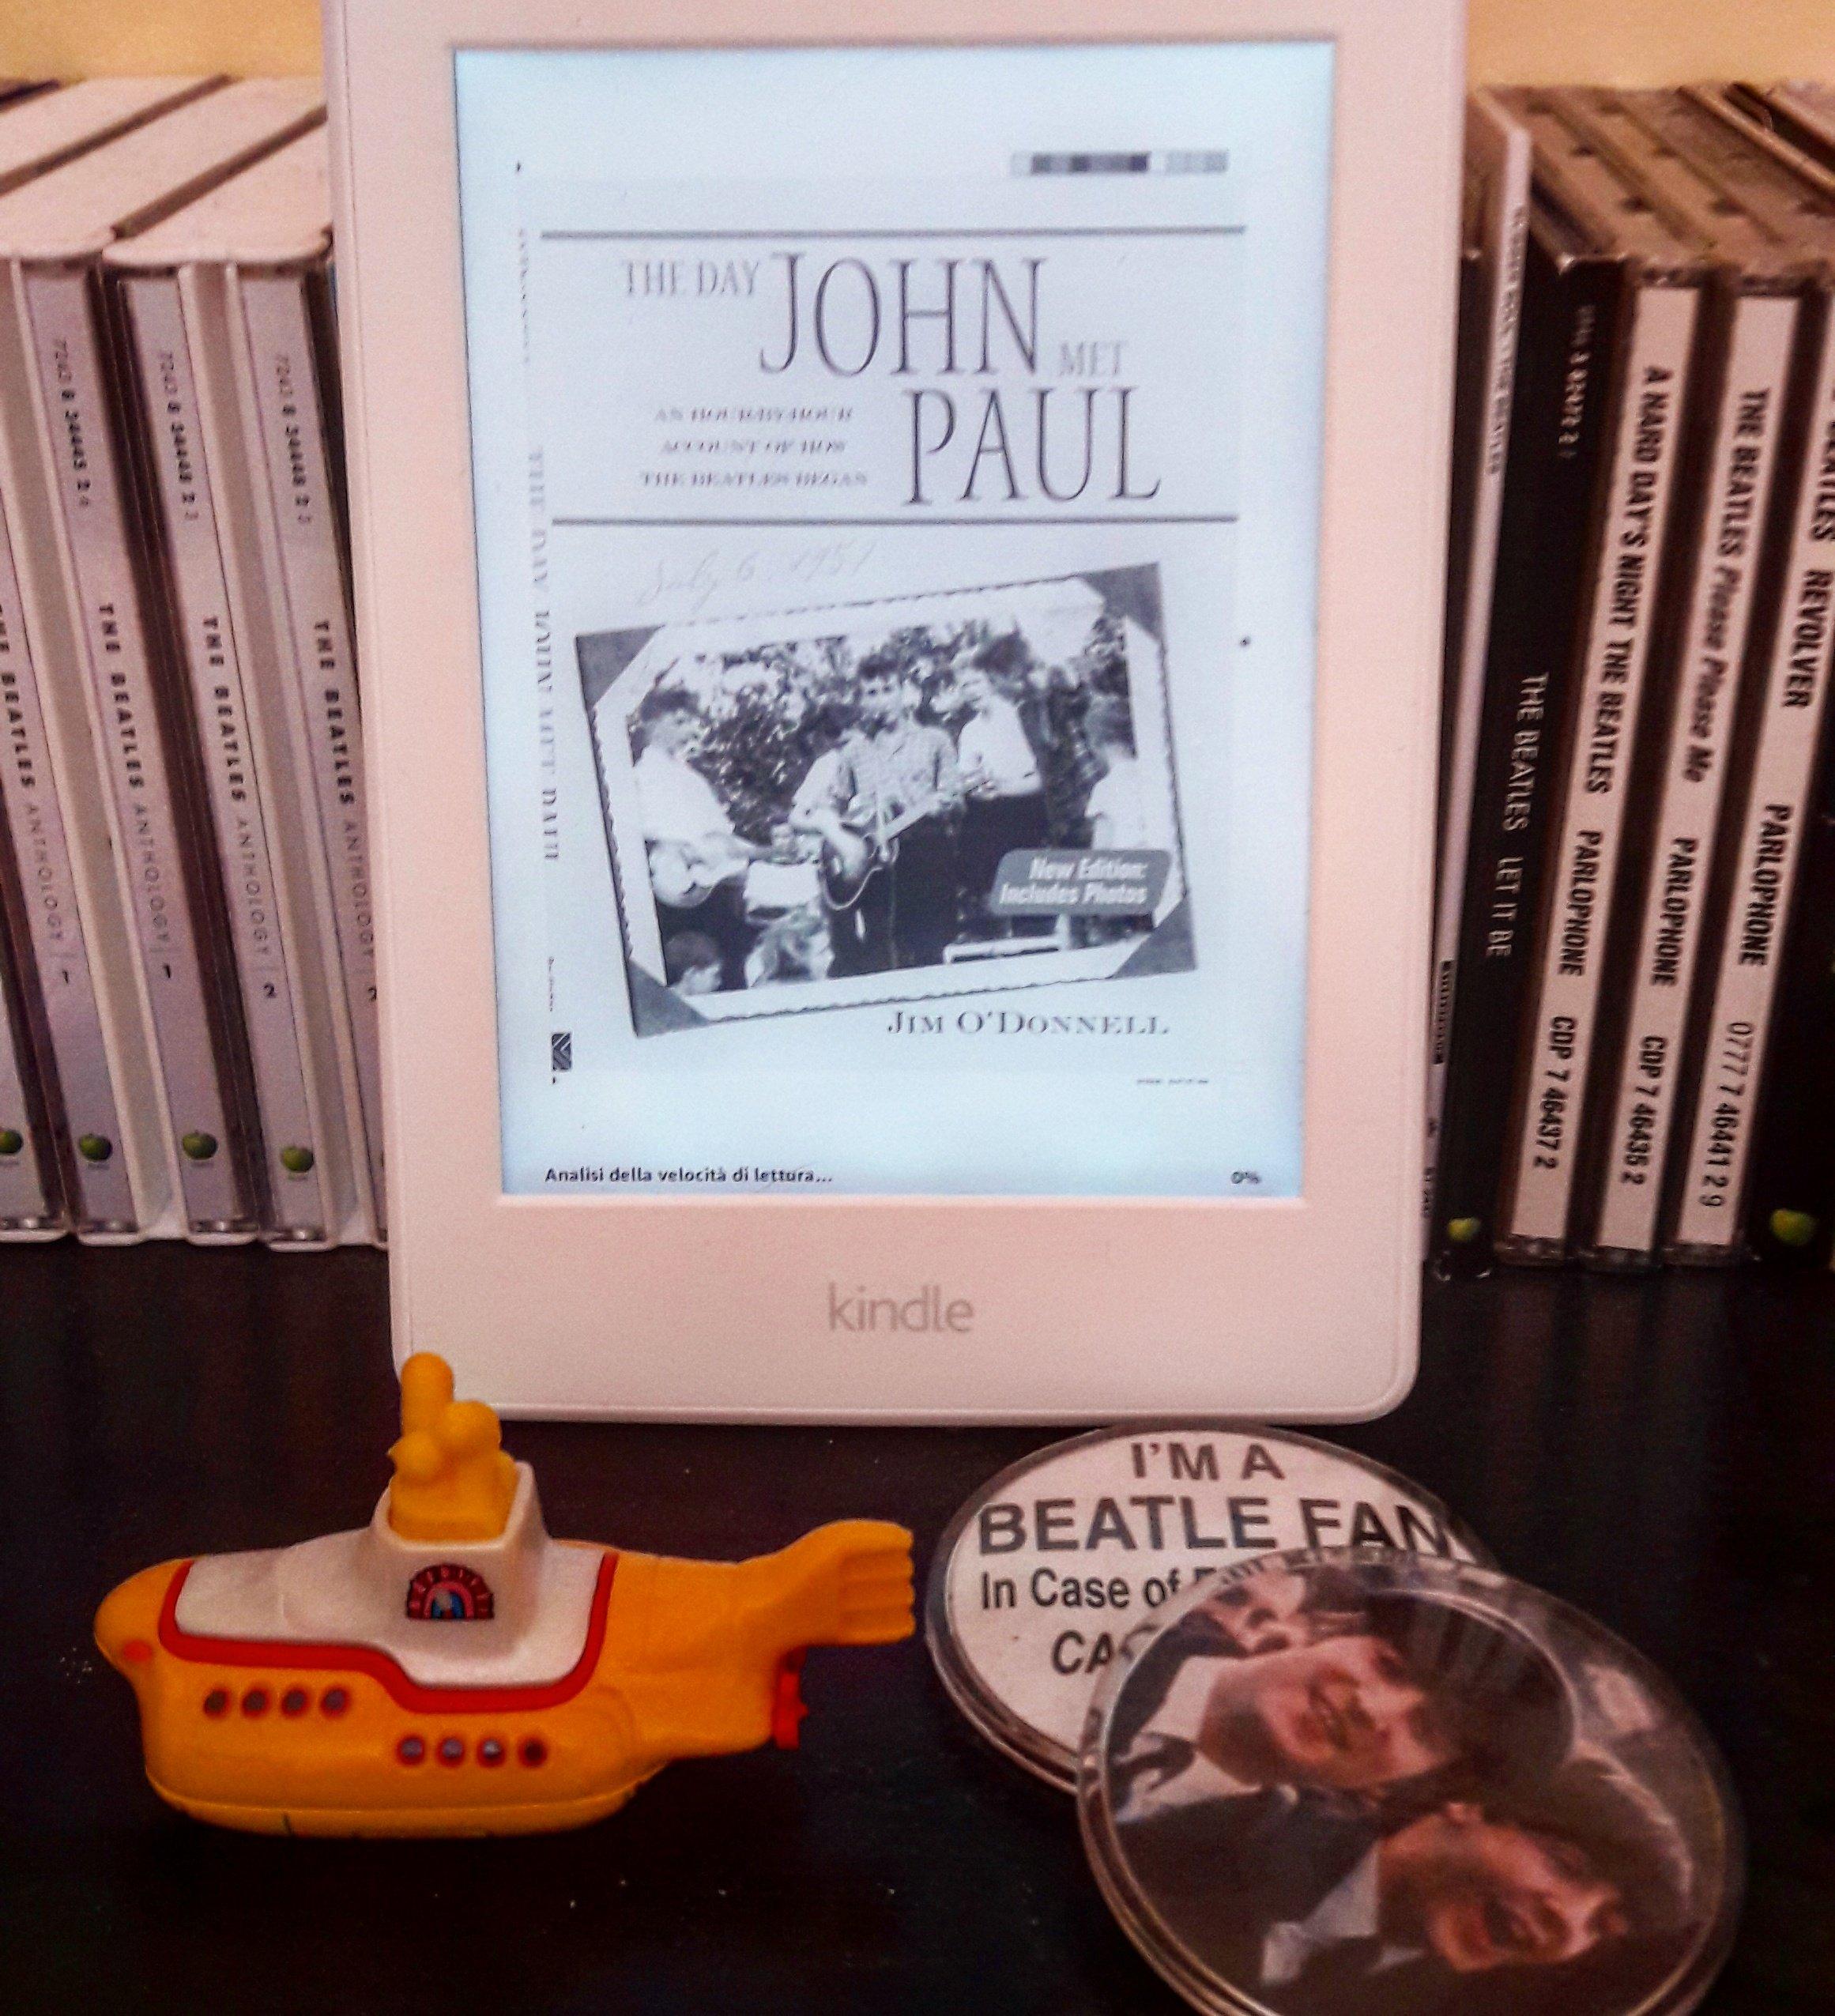 The day John met Paul, Jim O'Donnell